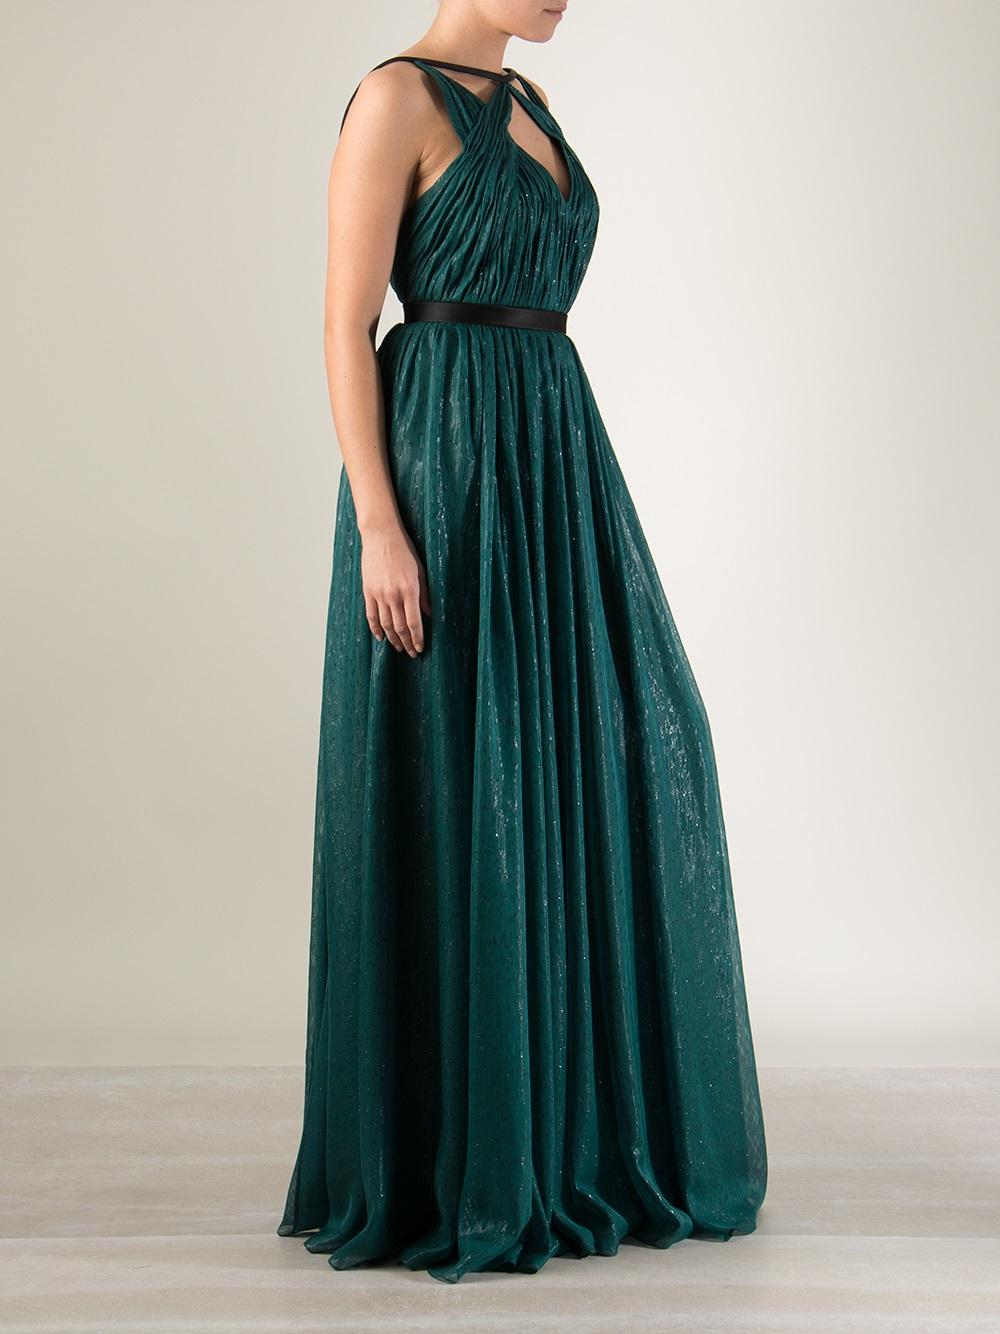 Lyst - Jason Wu Silk Lamé Gown in Green